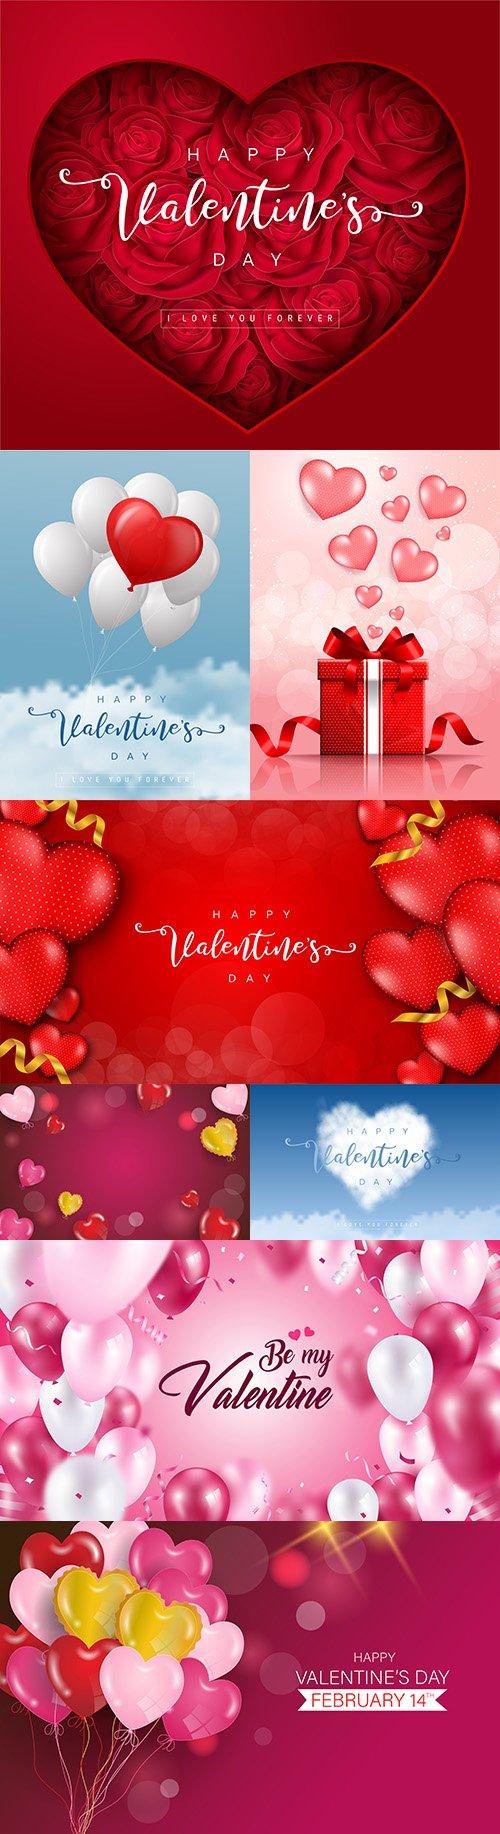 Valentine's Day romantic elements decorative illustrations 14